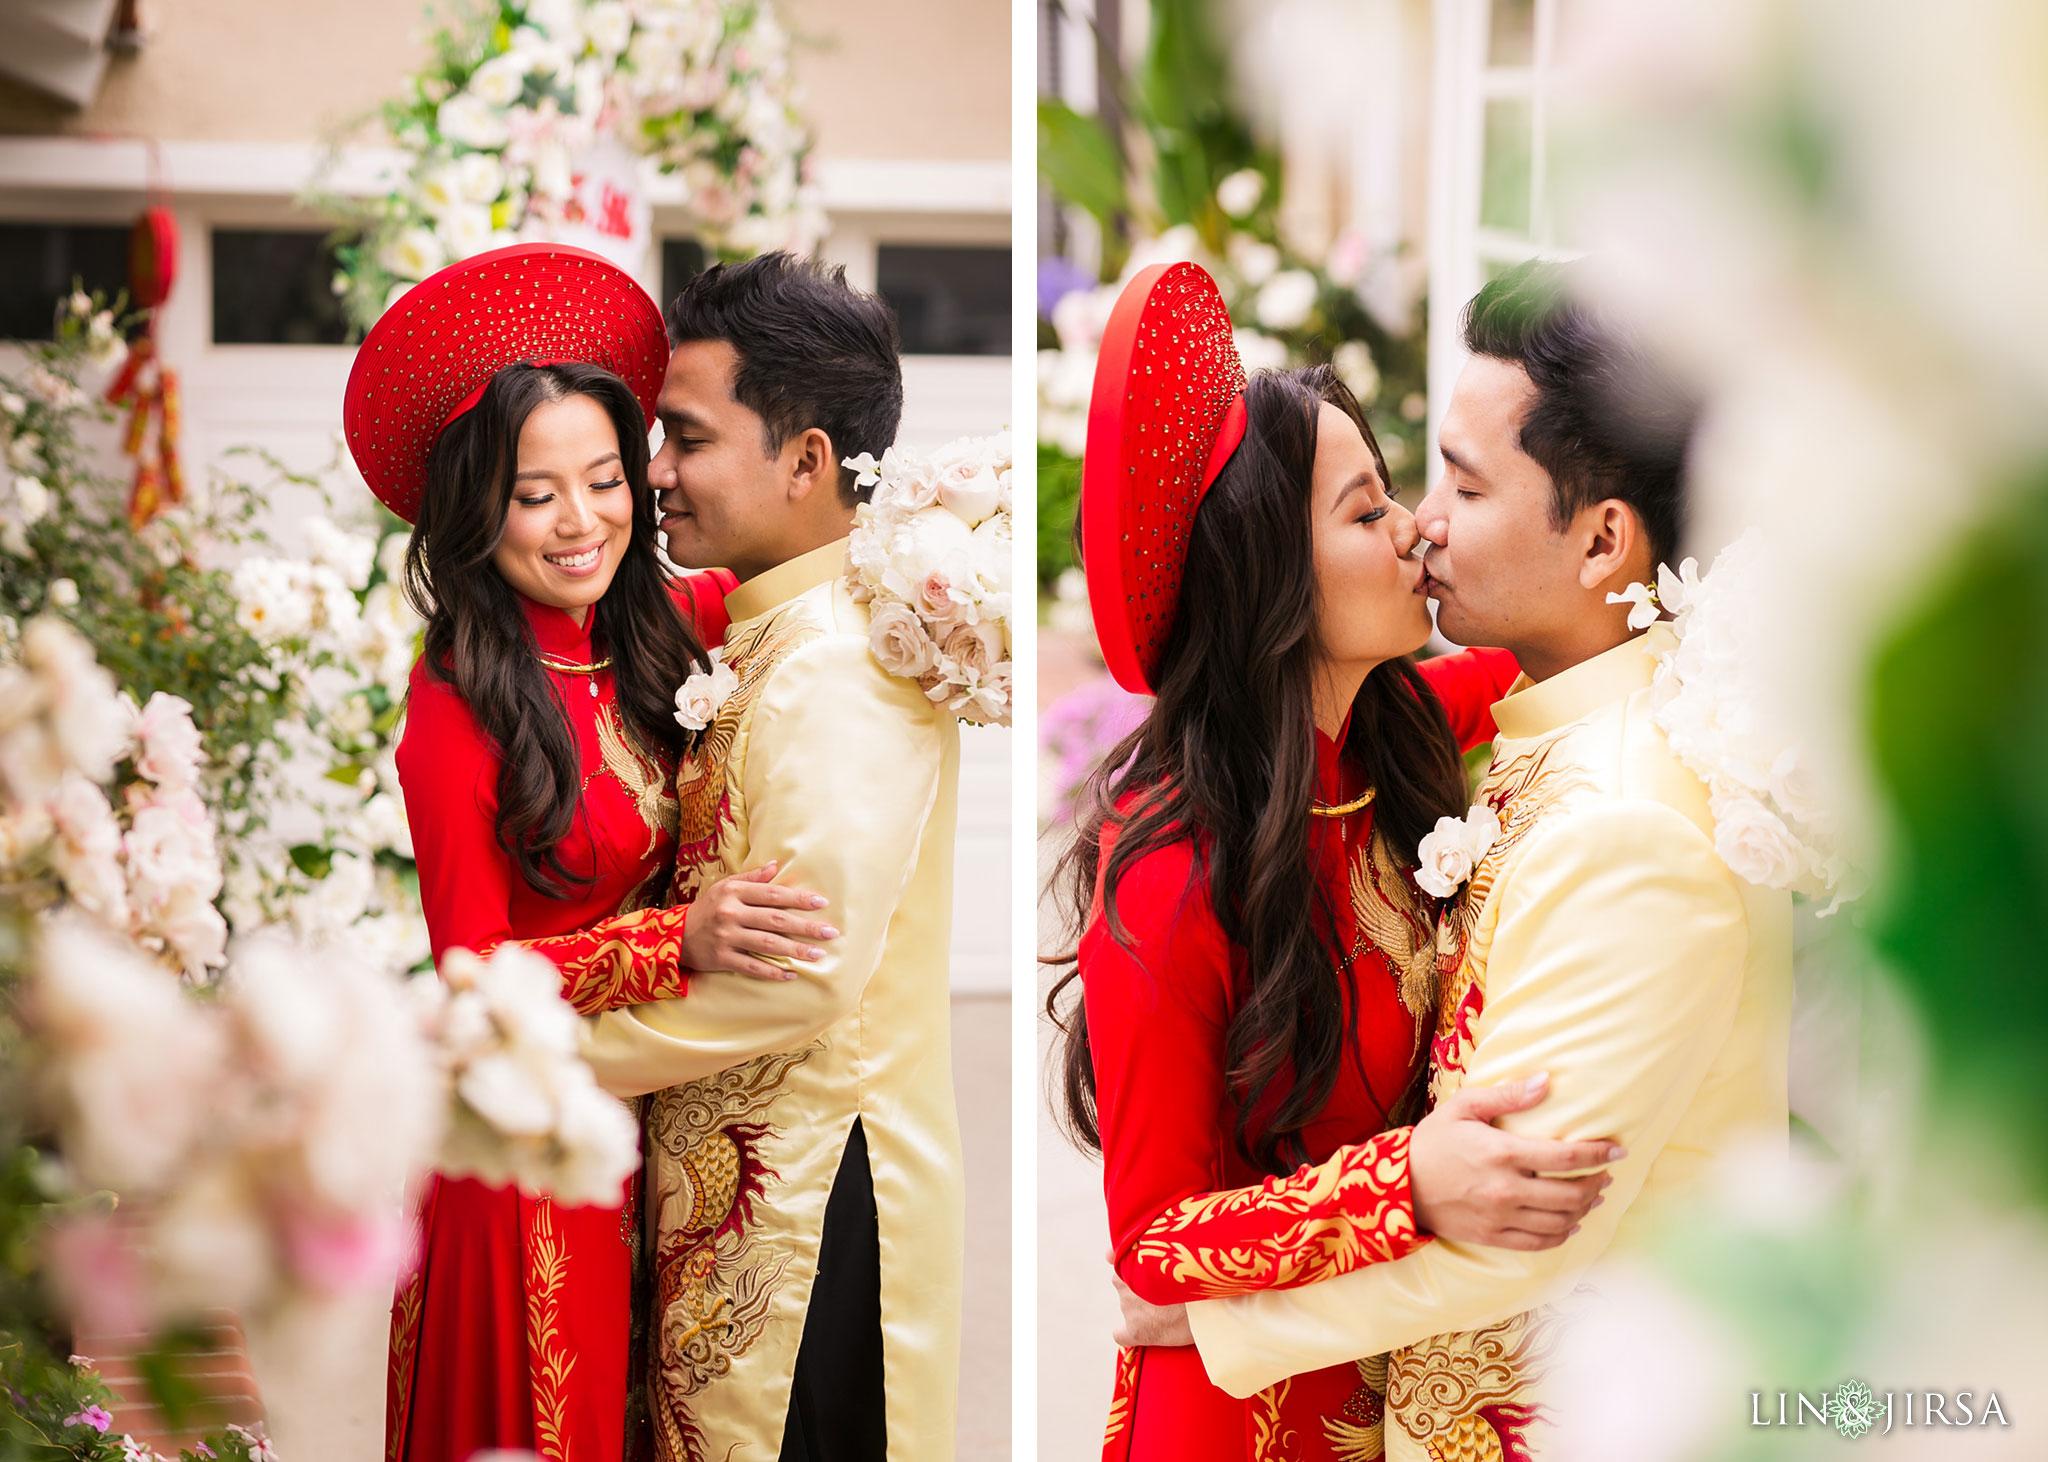 009 orange county vietnamese wedding photography